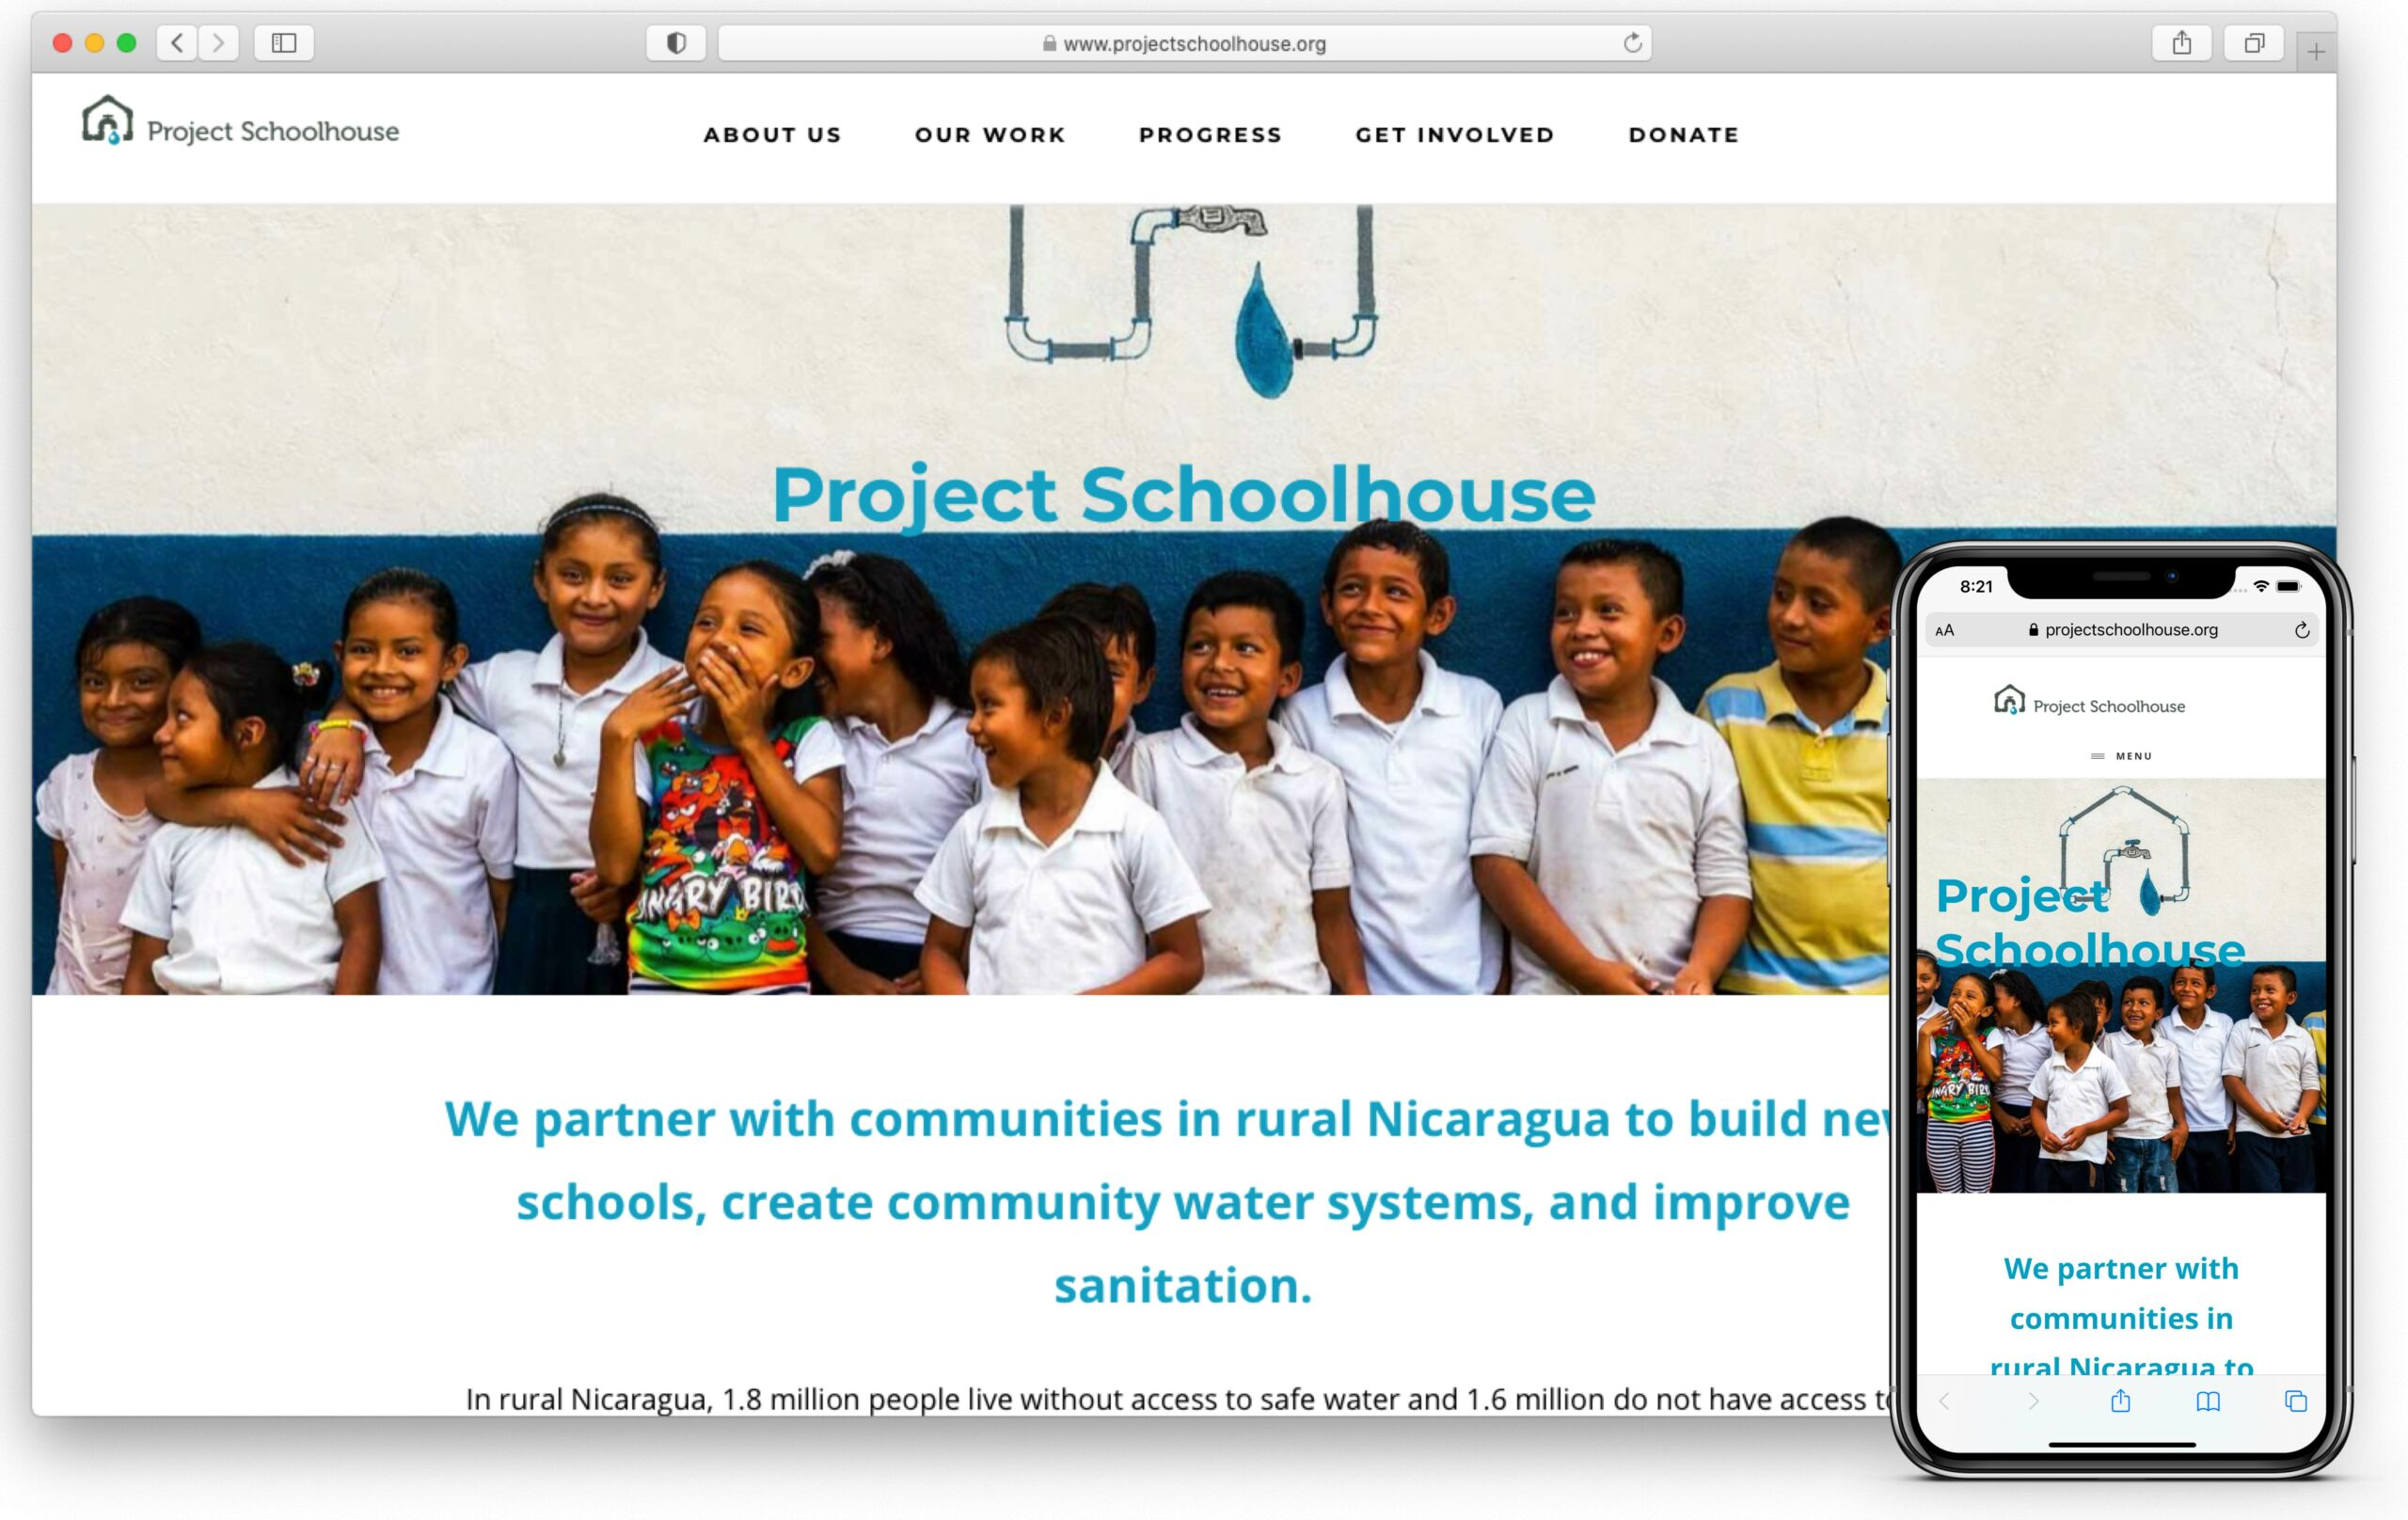 Project Schoolhouse Screenshot Image